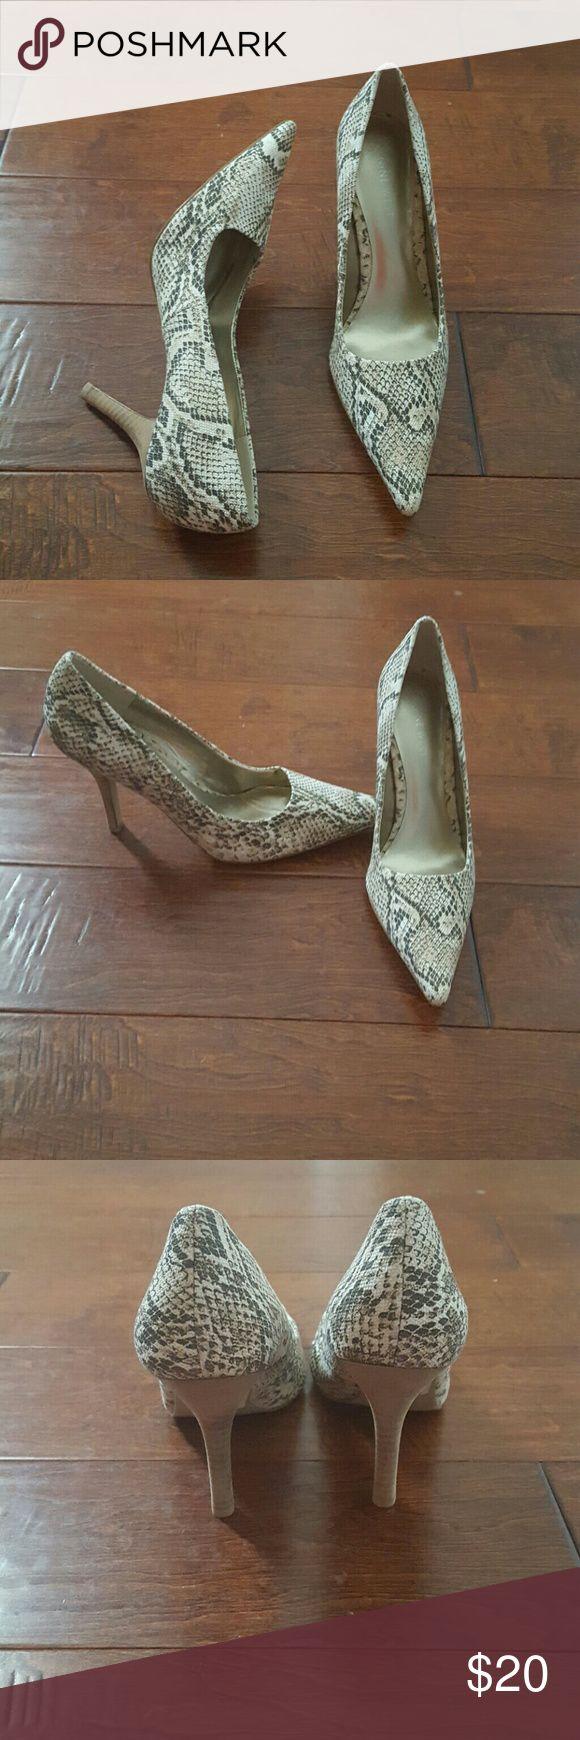 Sale! Nine West Heels Snake skin pumps Nine West Shoes Heels